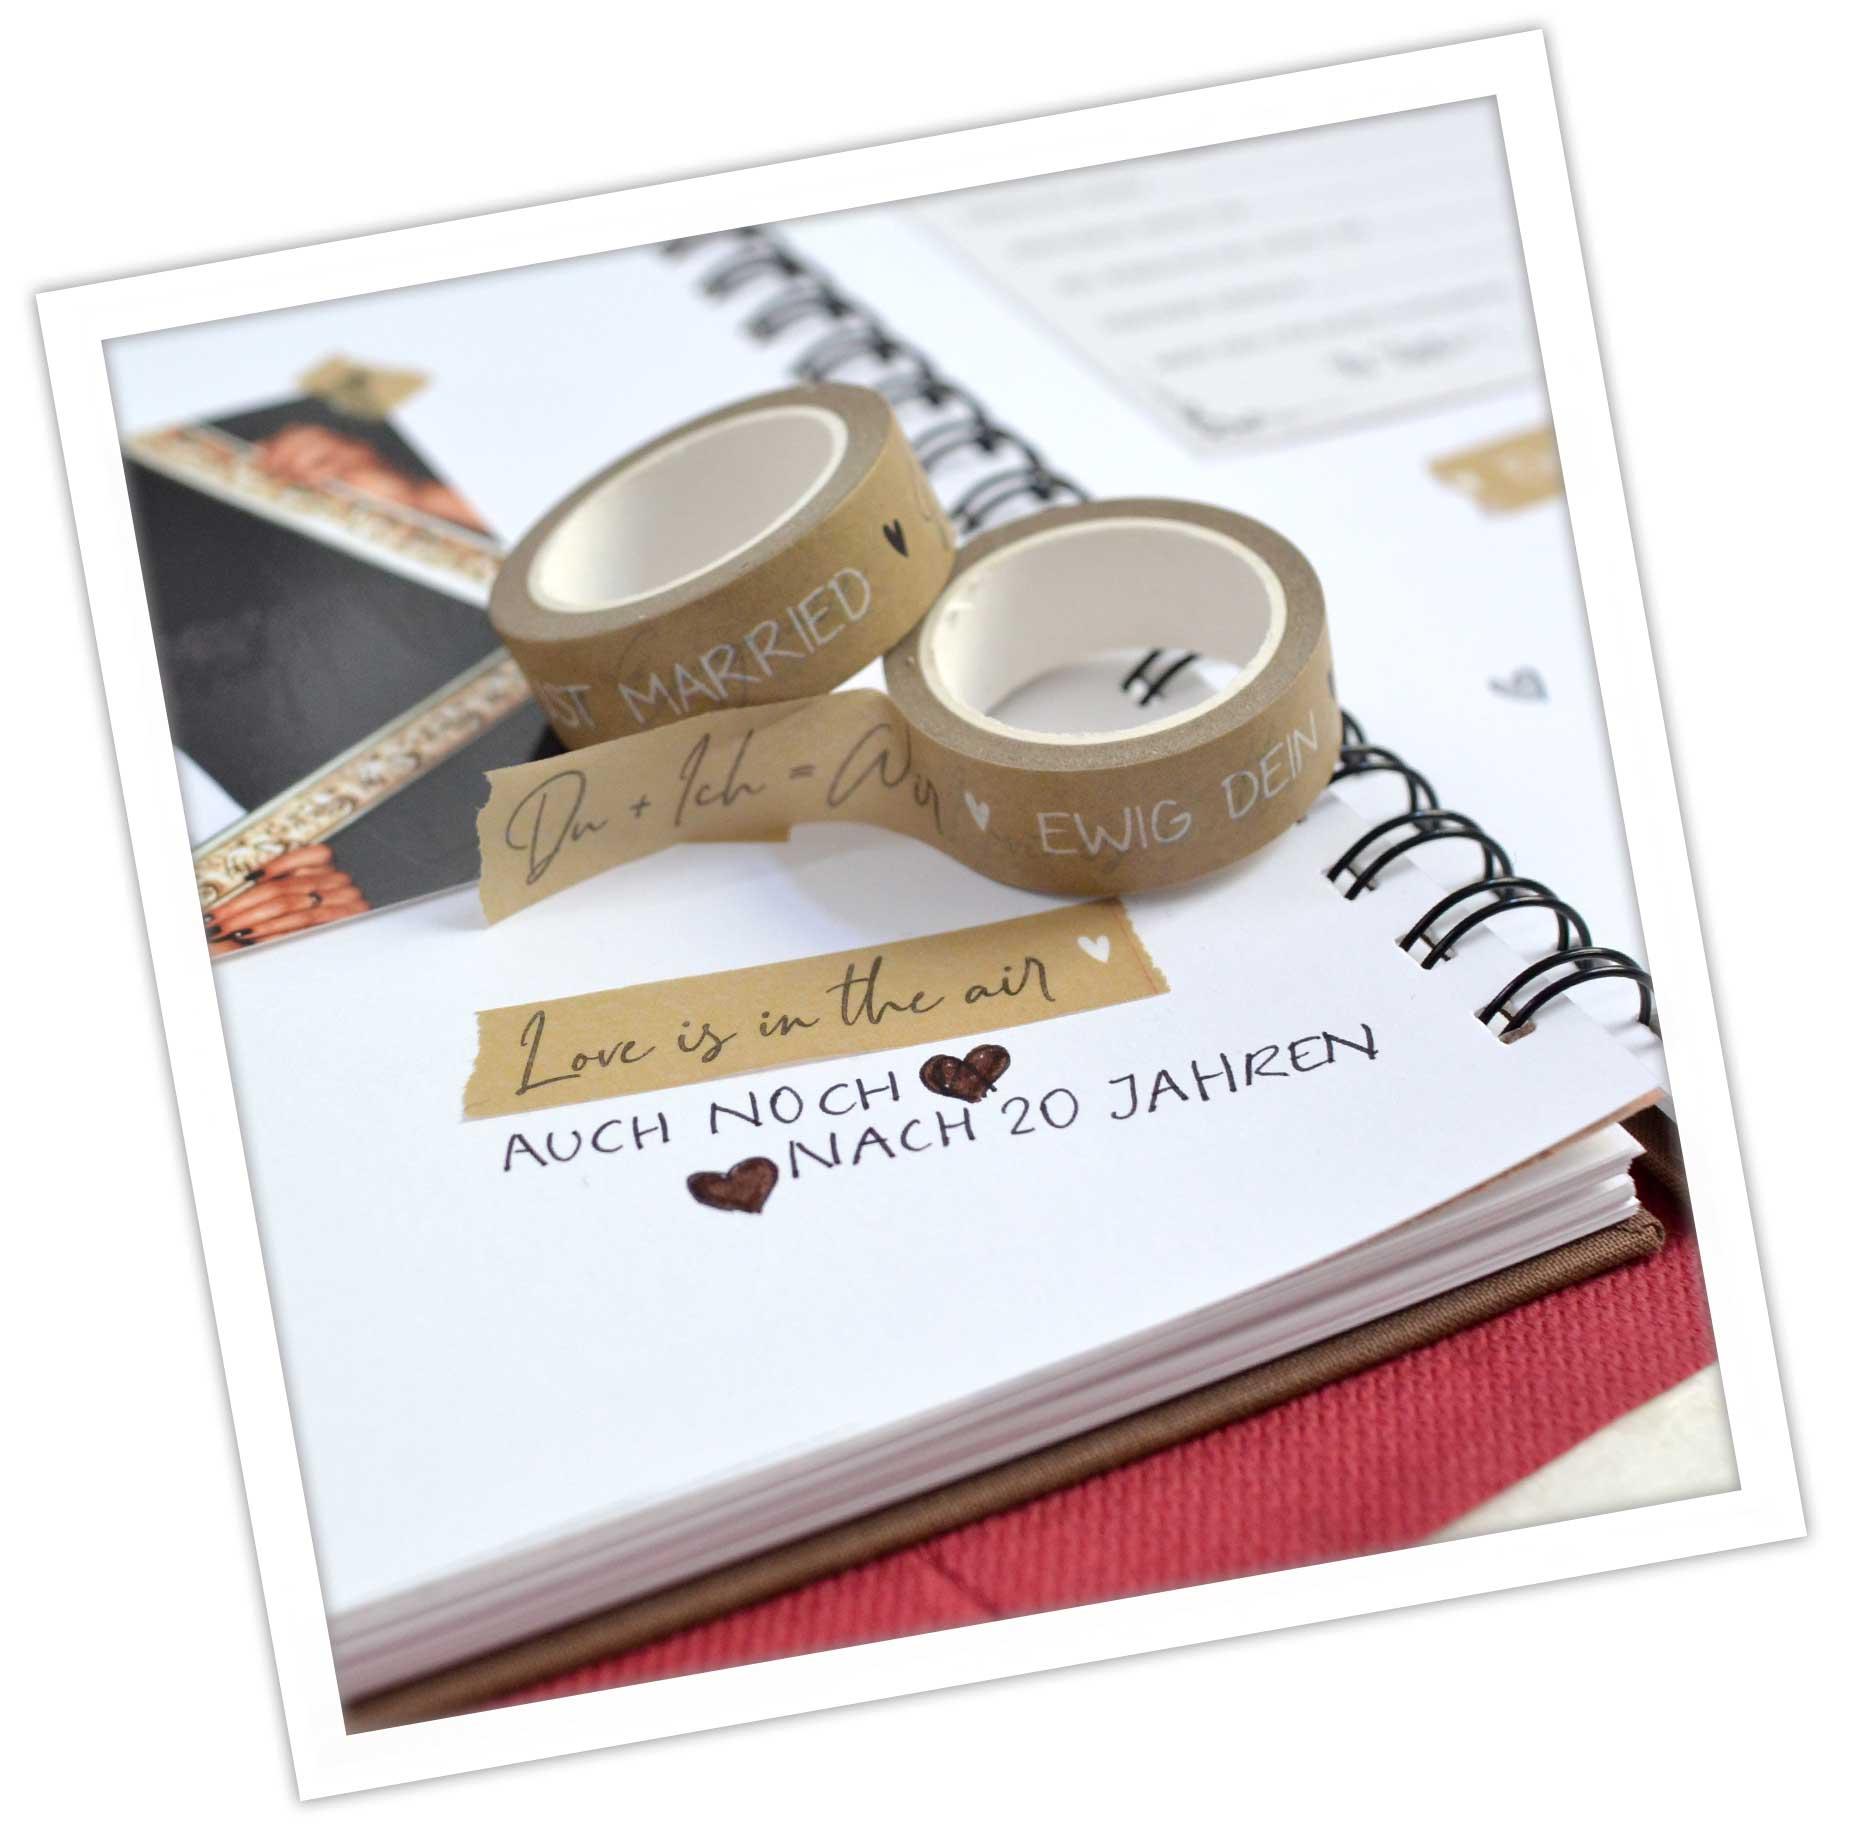 Gästebuch Gestaltung mit Washi Tapes, tolle DIY Idee